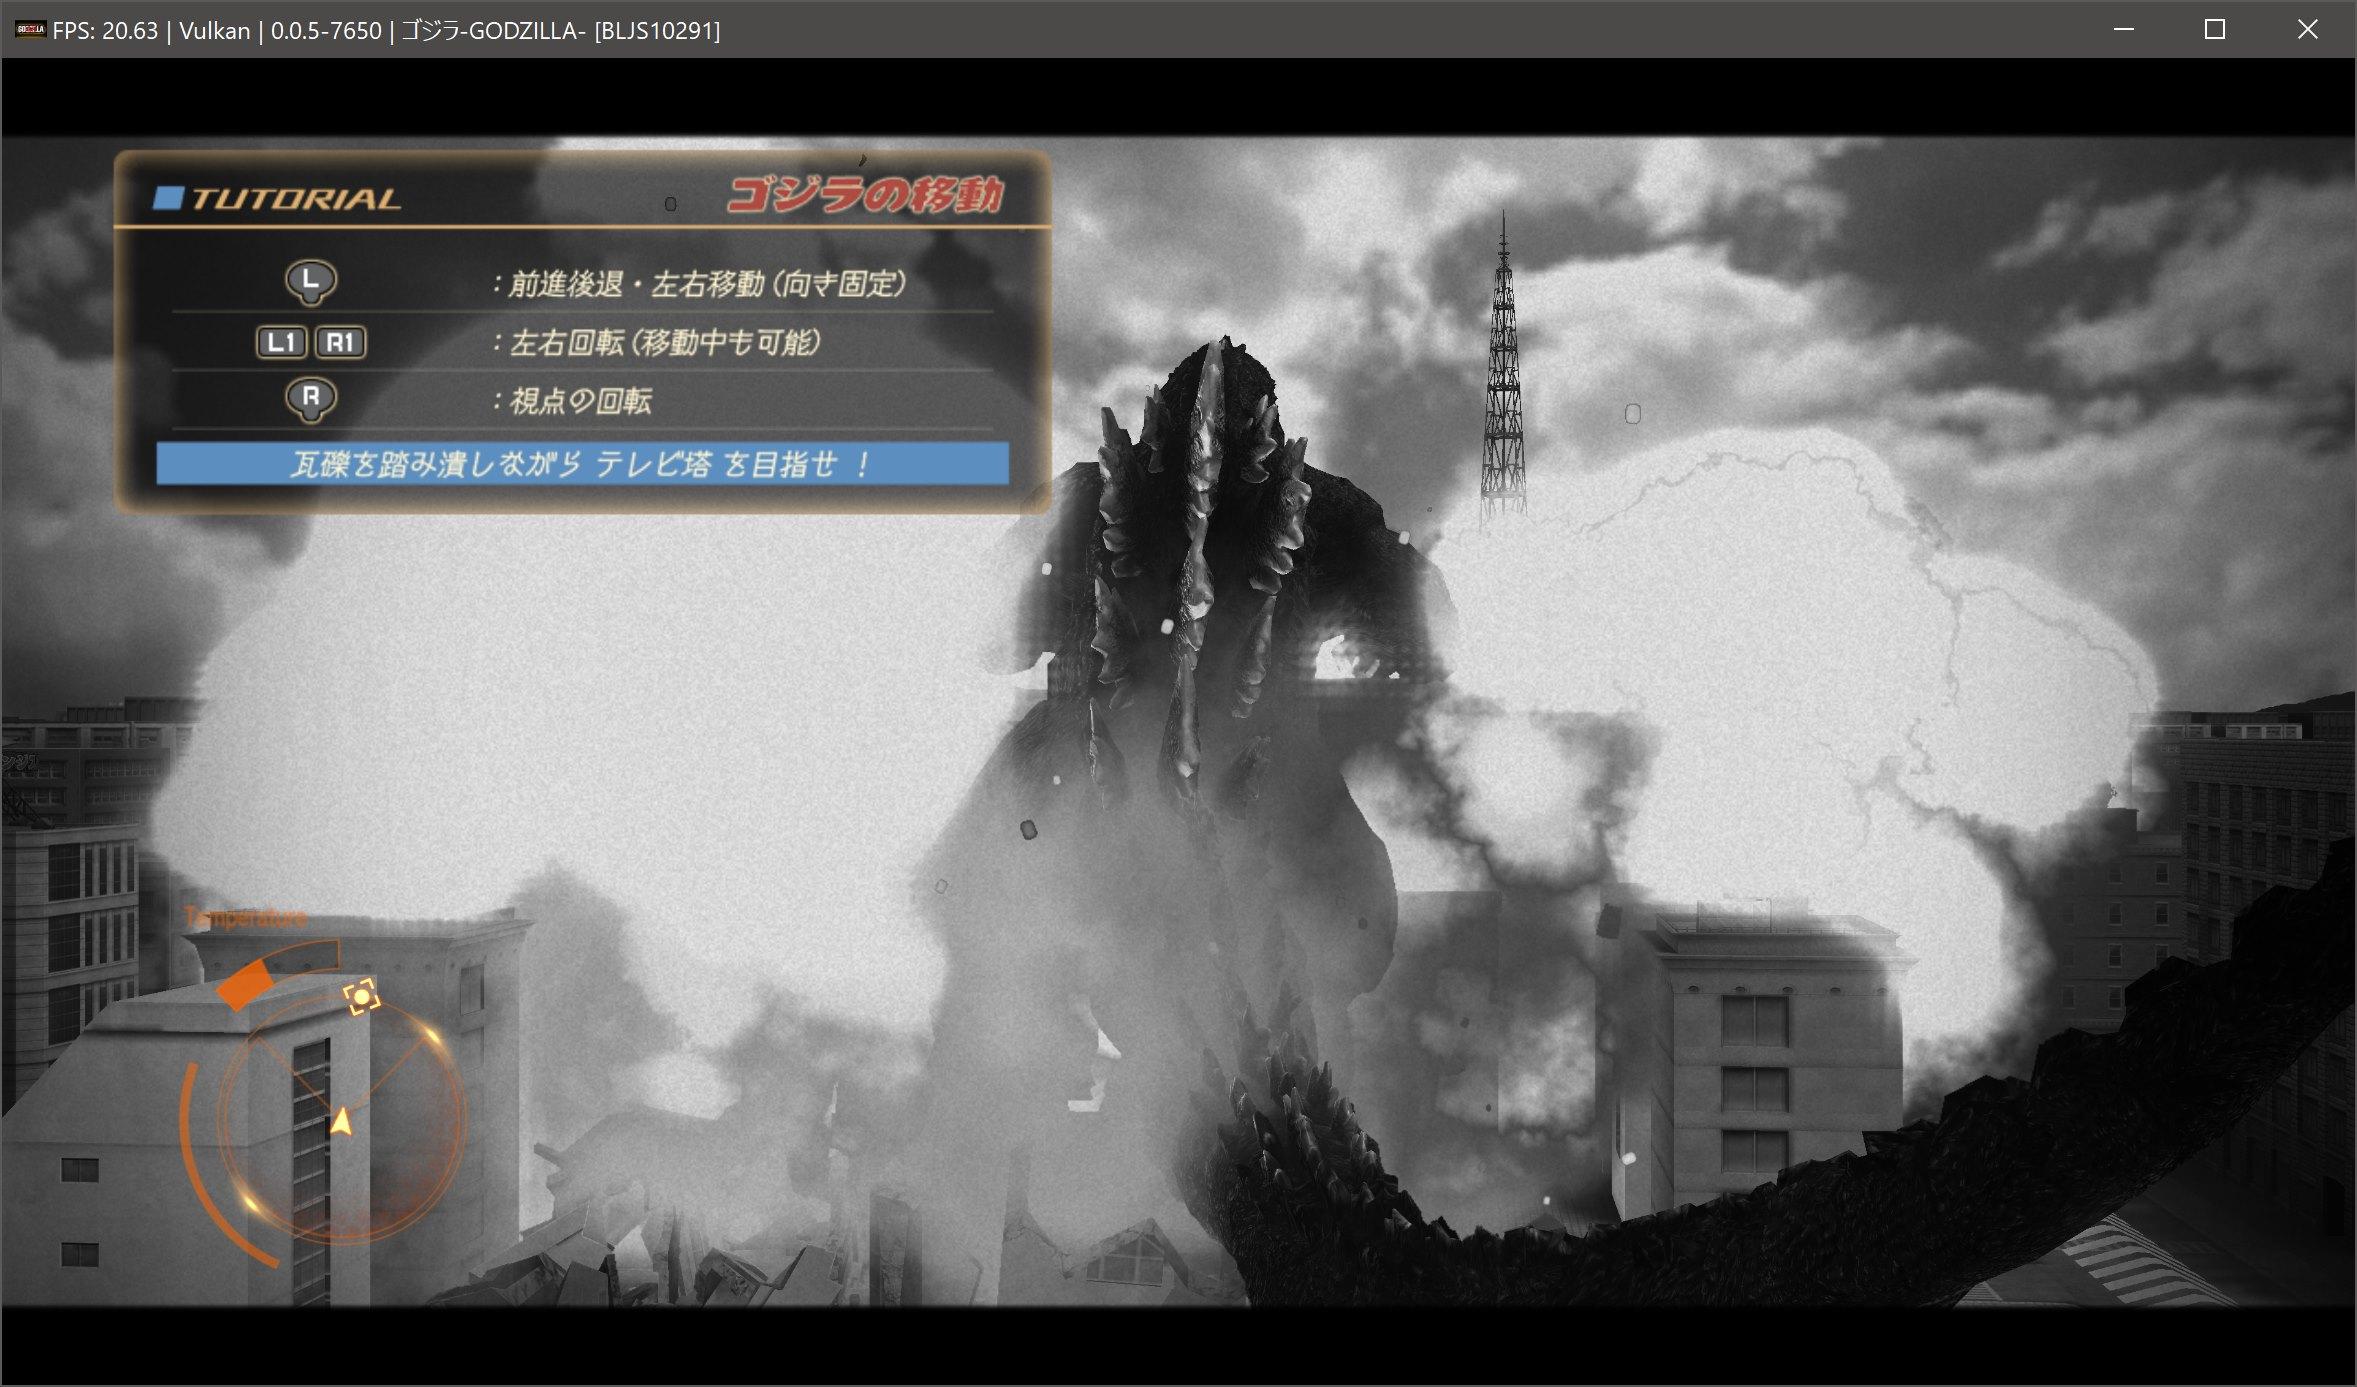 RPCS3 Sony PlayStation 3 Emulator - CHOCHILINO